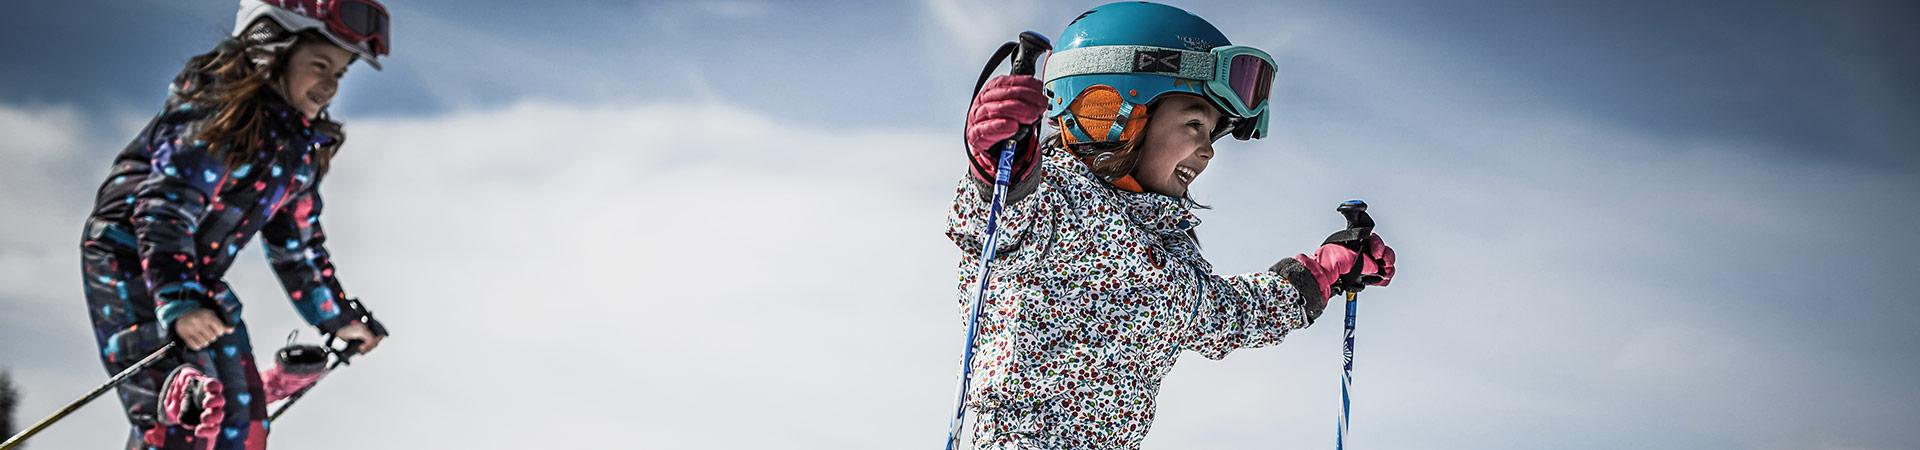 ecole-ski__1_.jpg